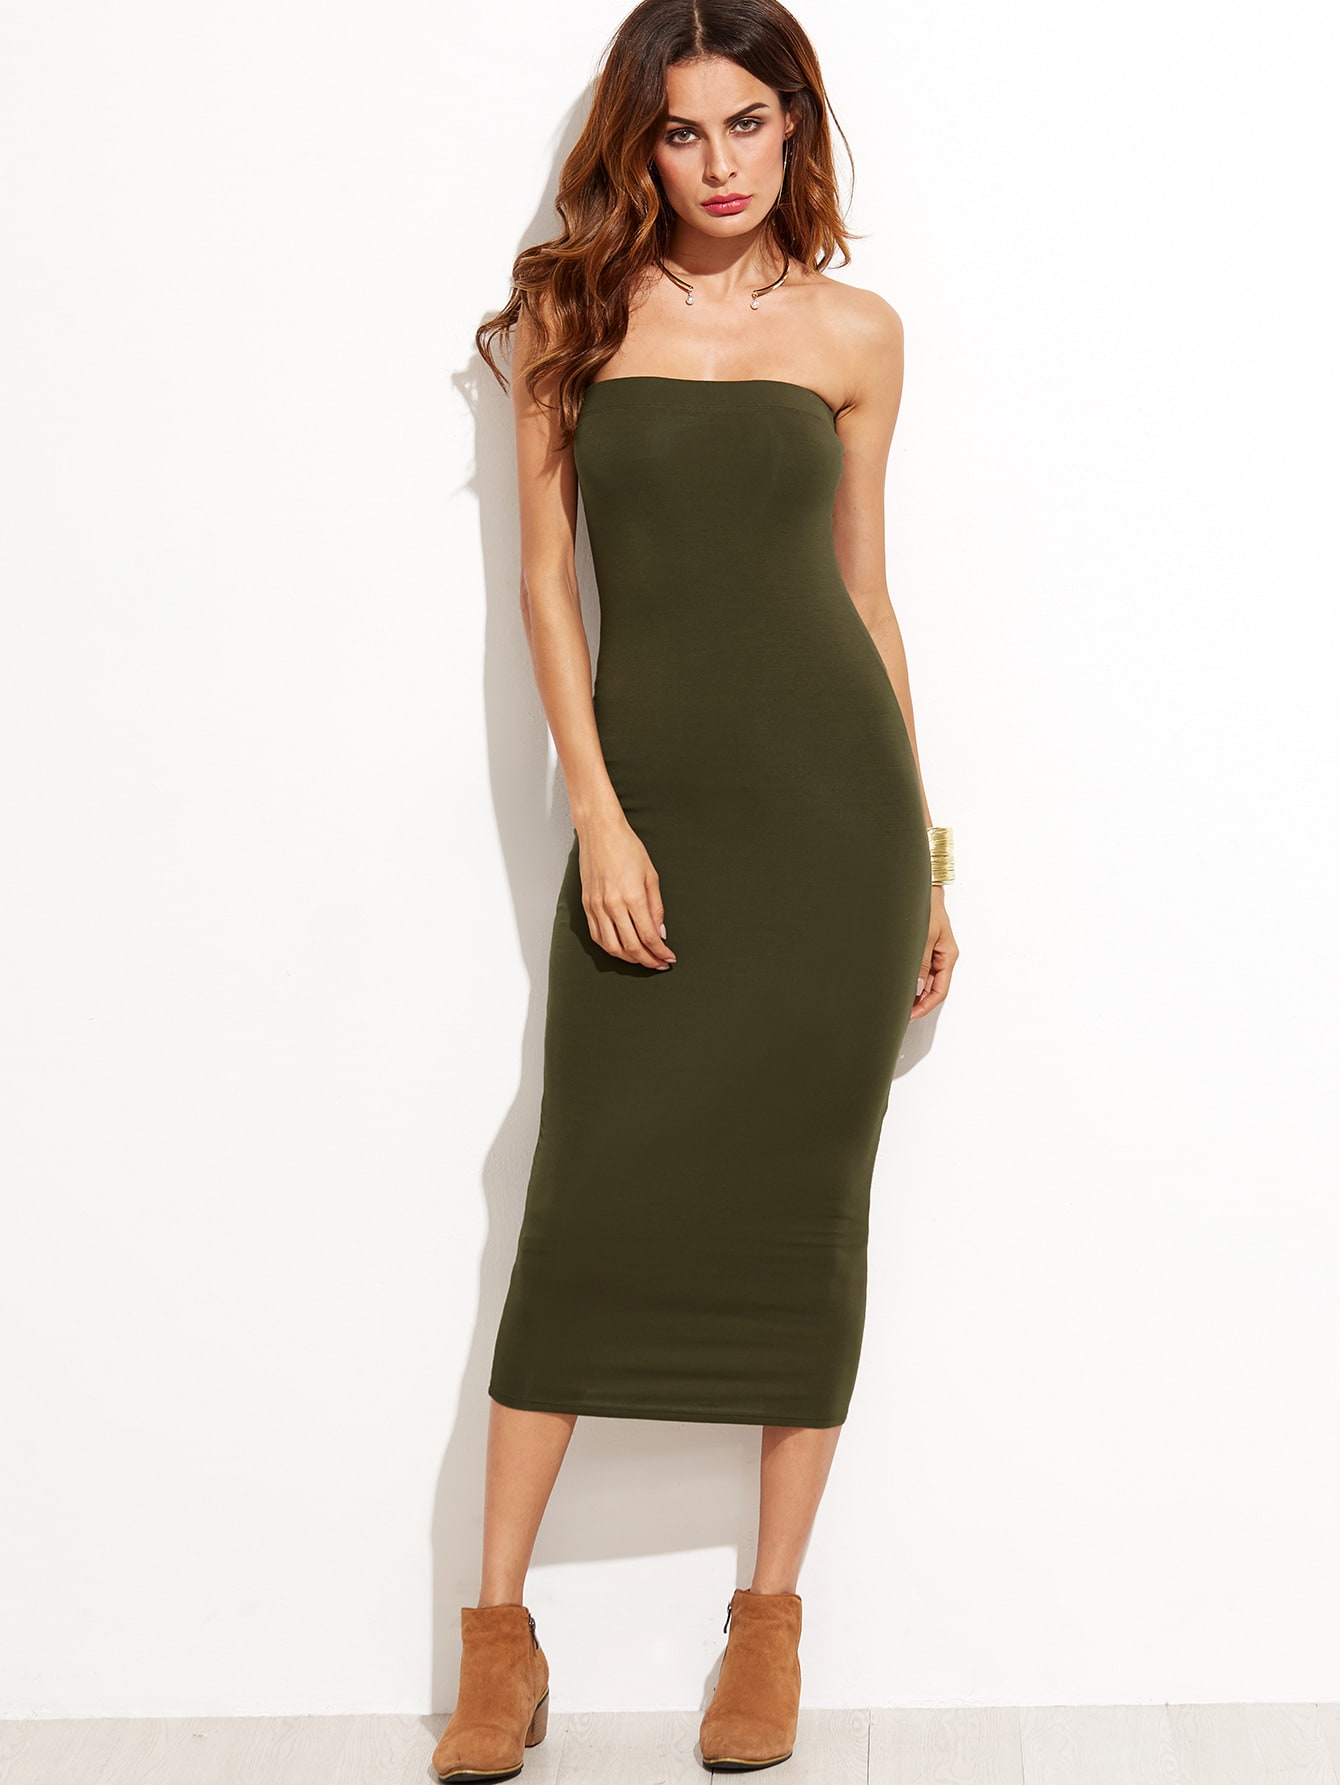 3d6d1a1ed7ebe4 Army Green Sheath Tube Dress EmmaCloth-Women Fast Fashion ...